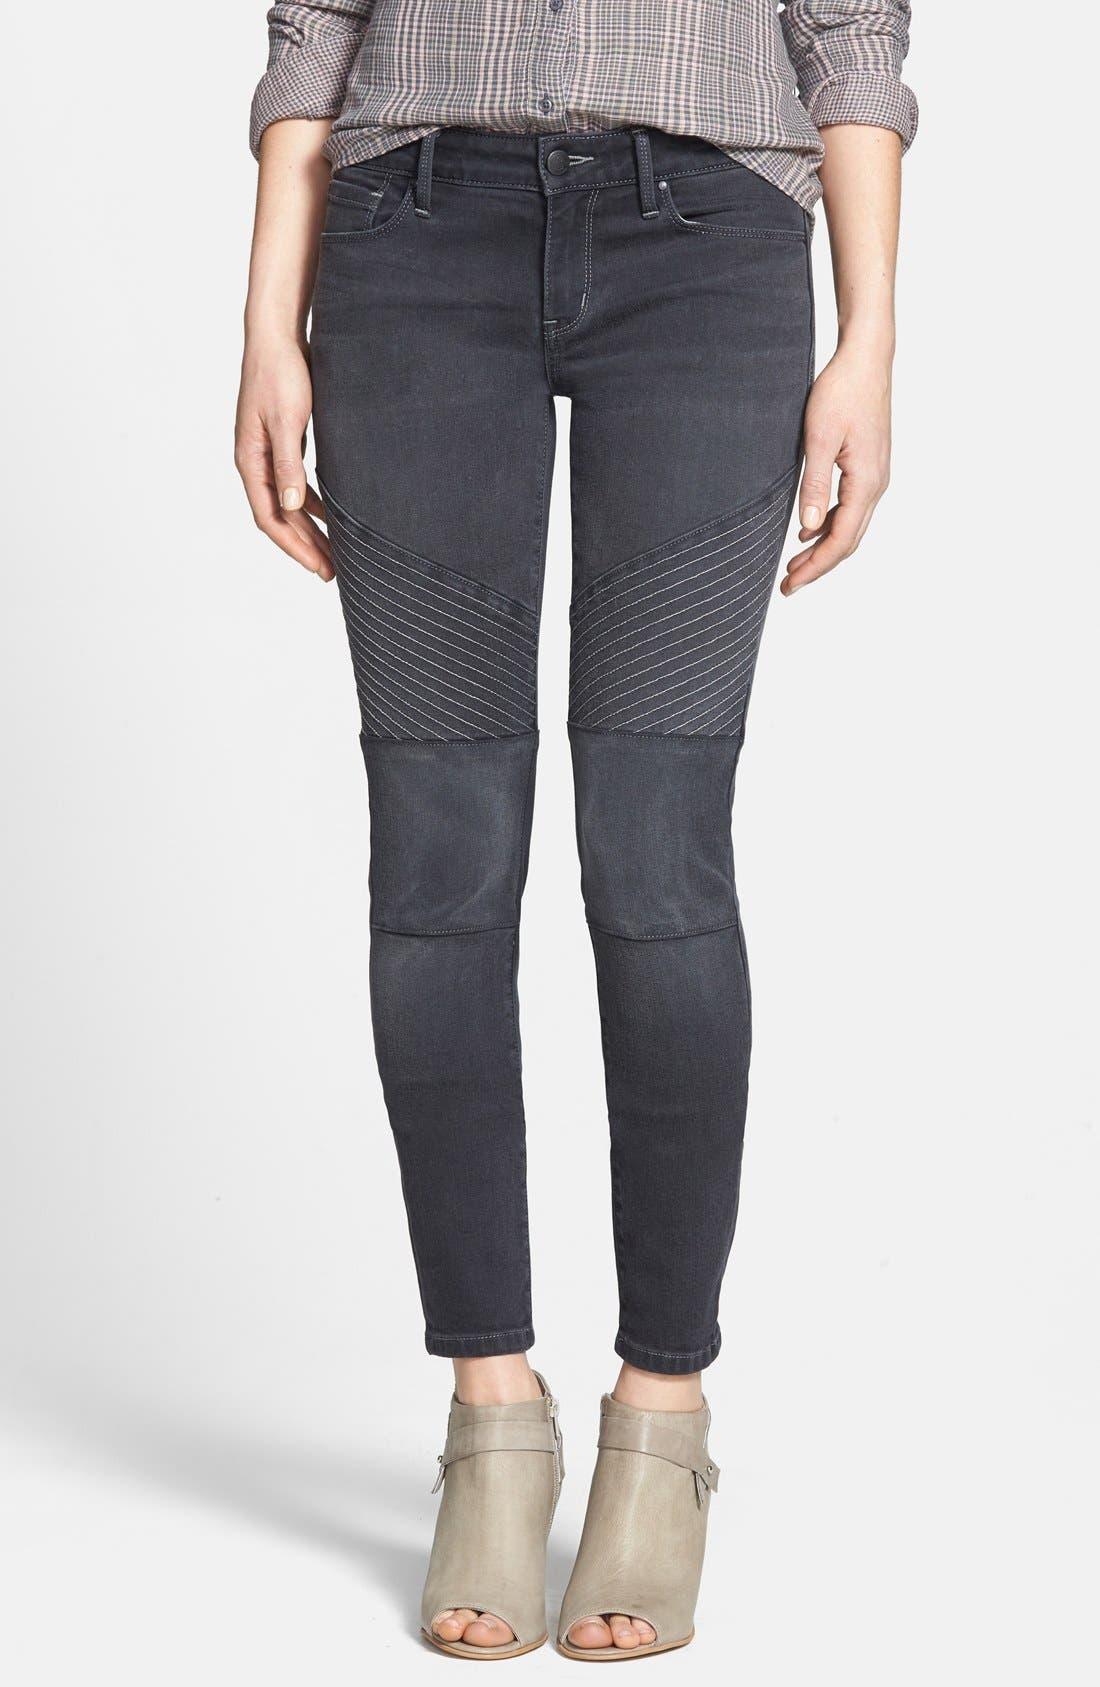 Alternate Image 1 Selected - Treasure&Bond Moto Jeans (Washed Black)